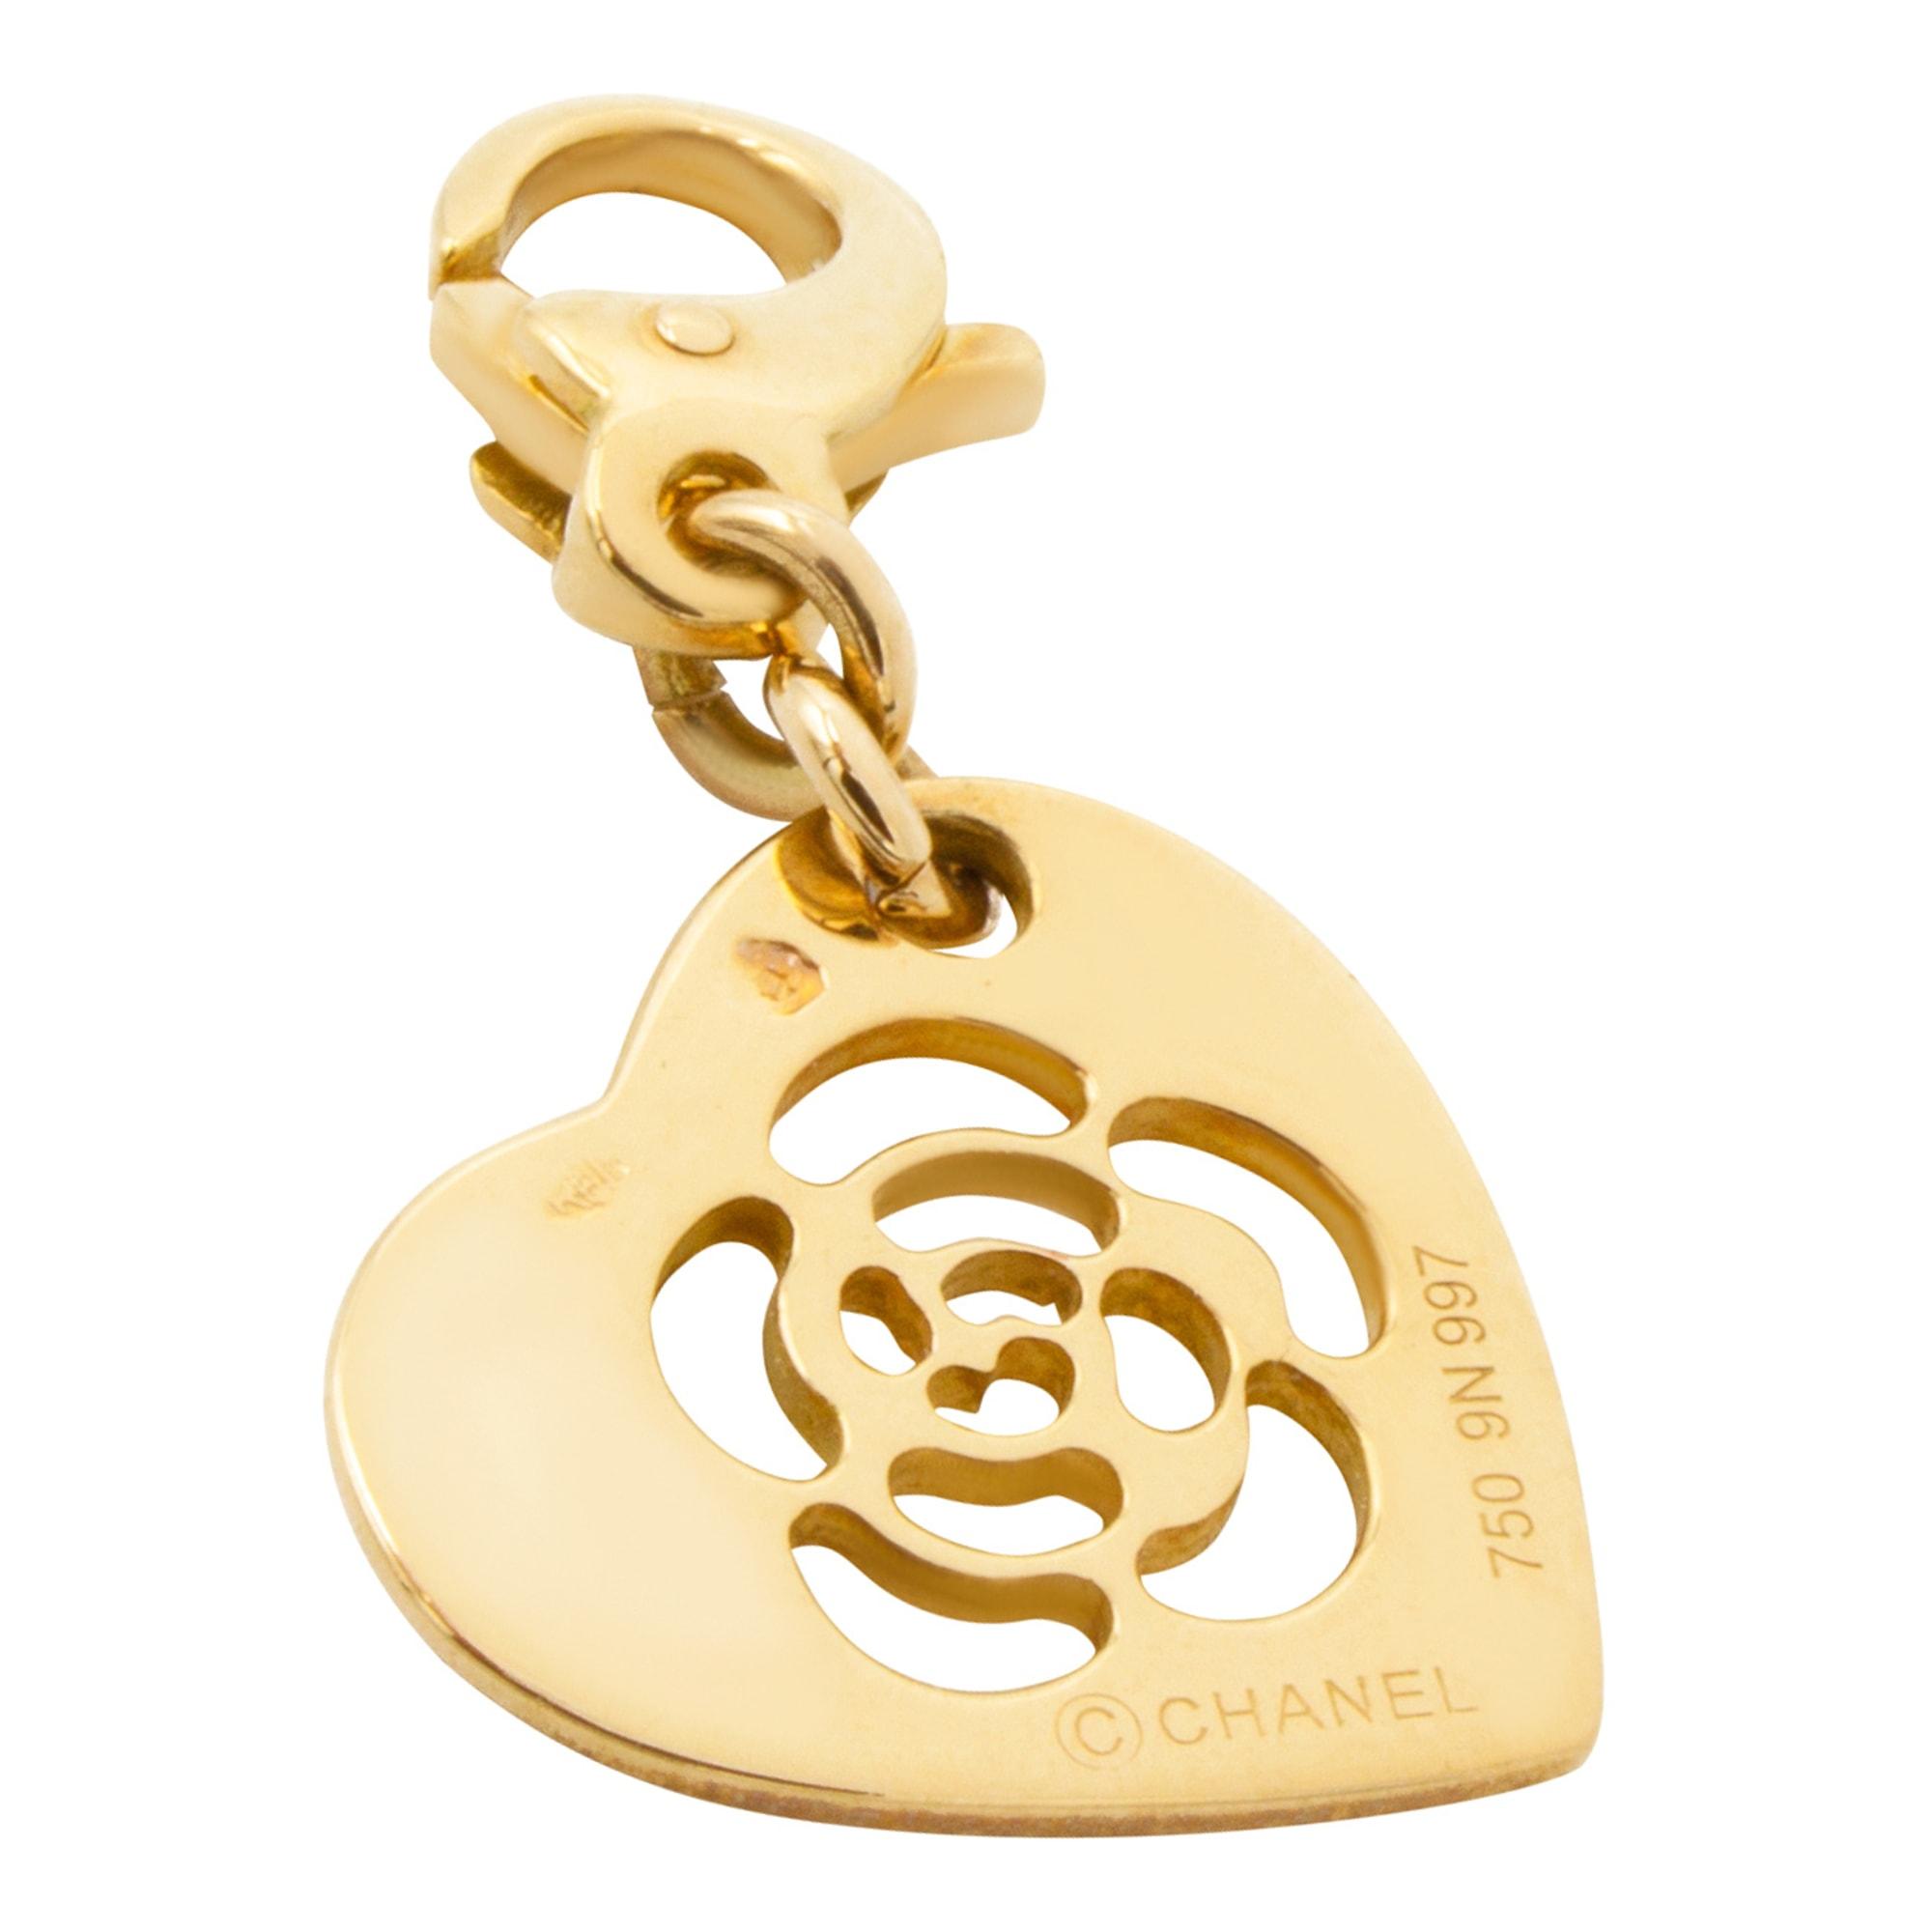 Pendentif, collier pendentif CHANEL Camelia Doré, bronze, cuivre